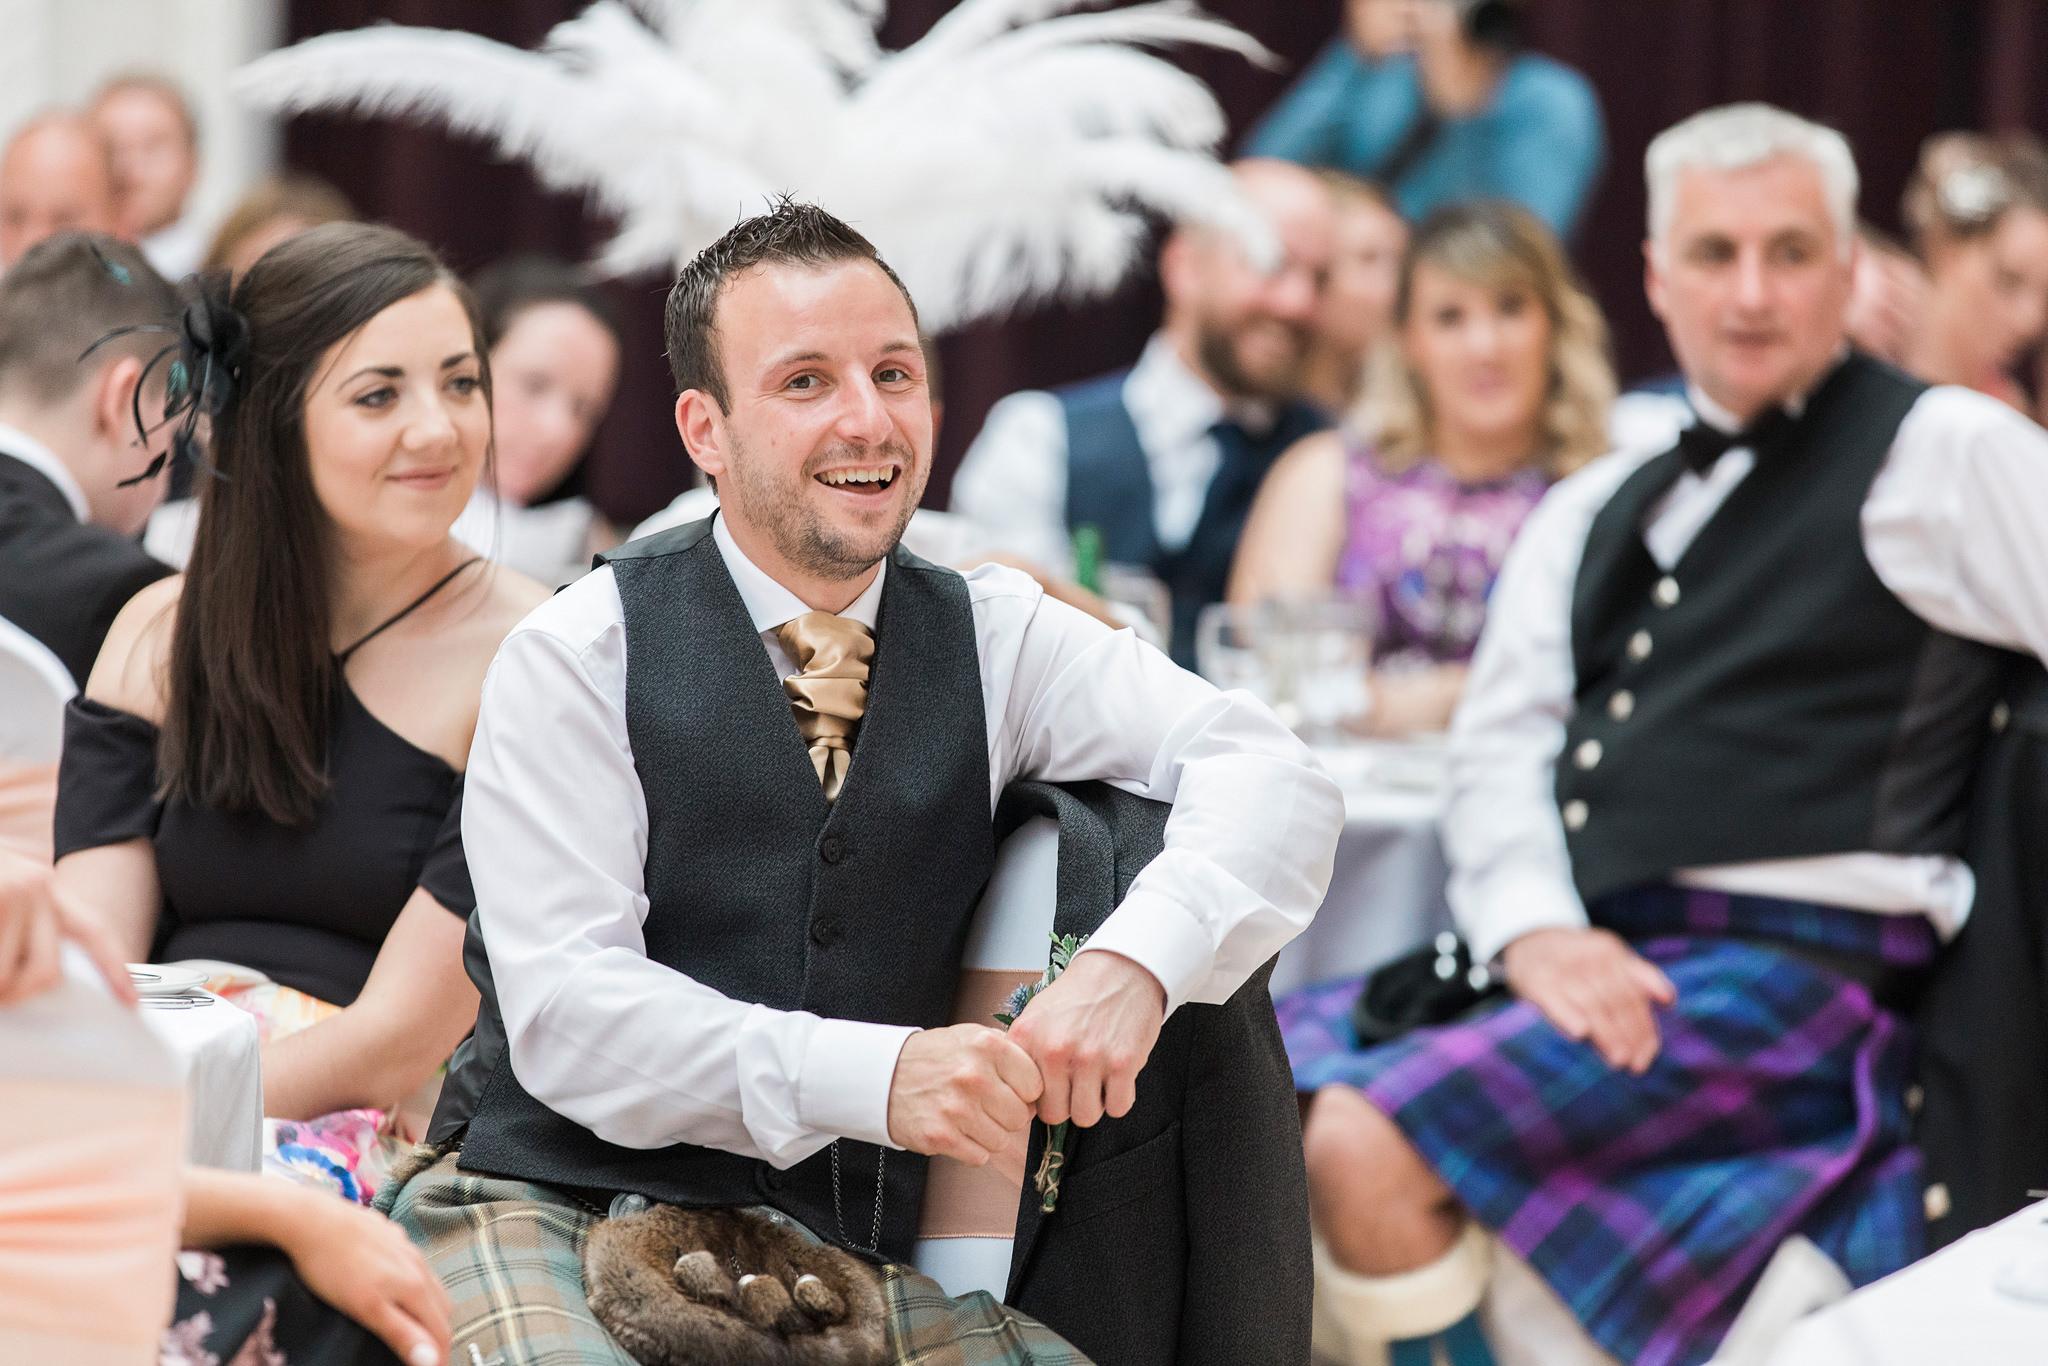 106-desination-wedding-photographer-scotland.jpg